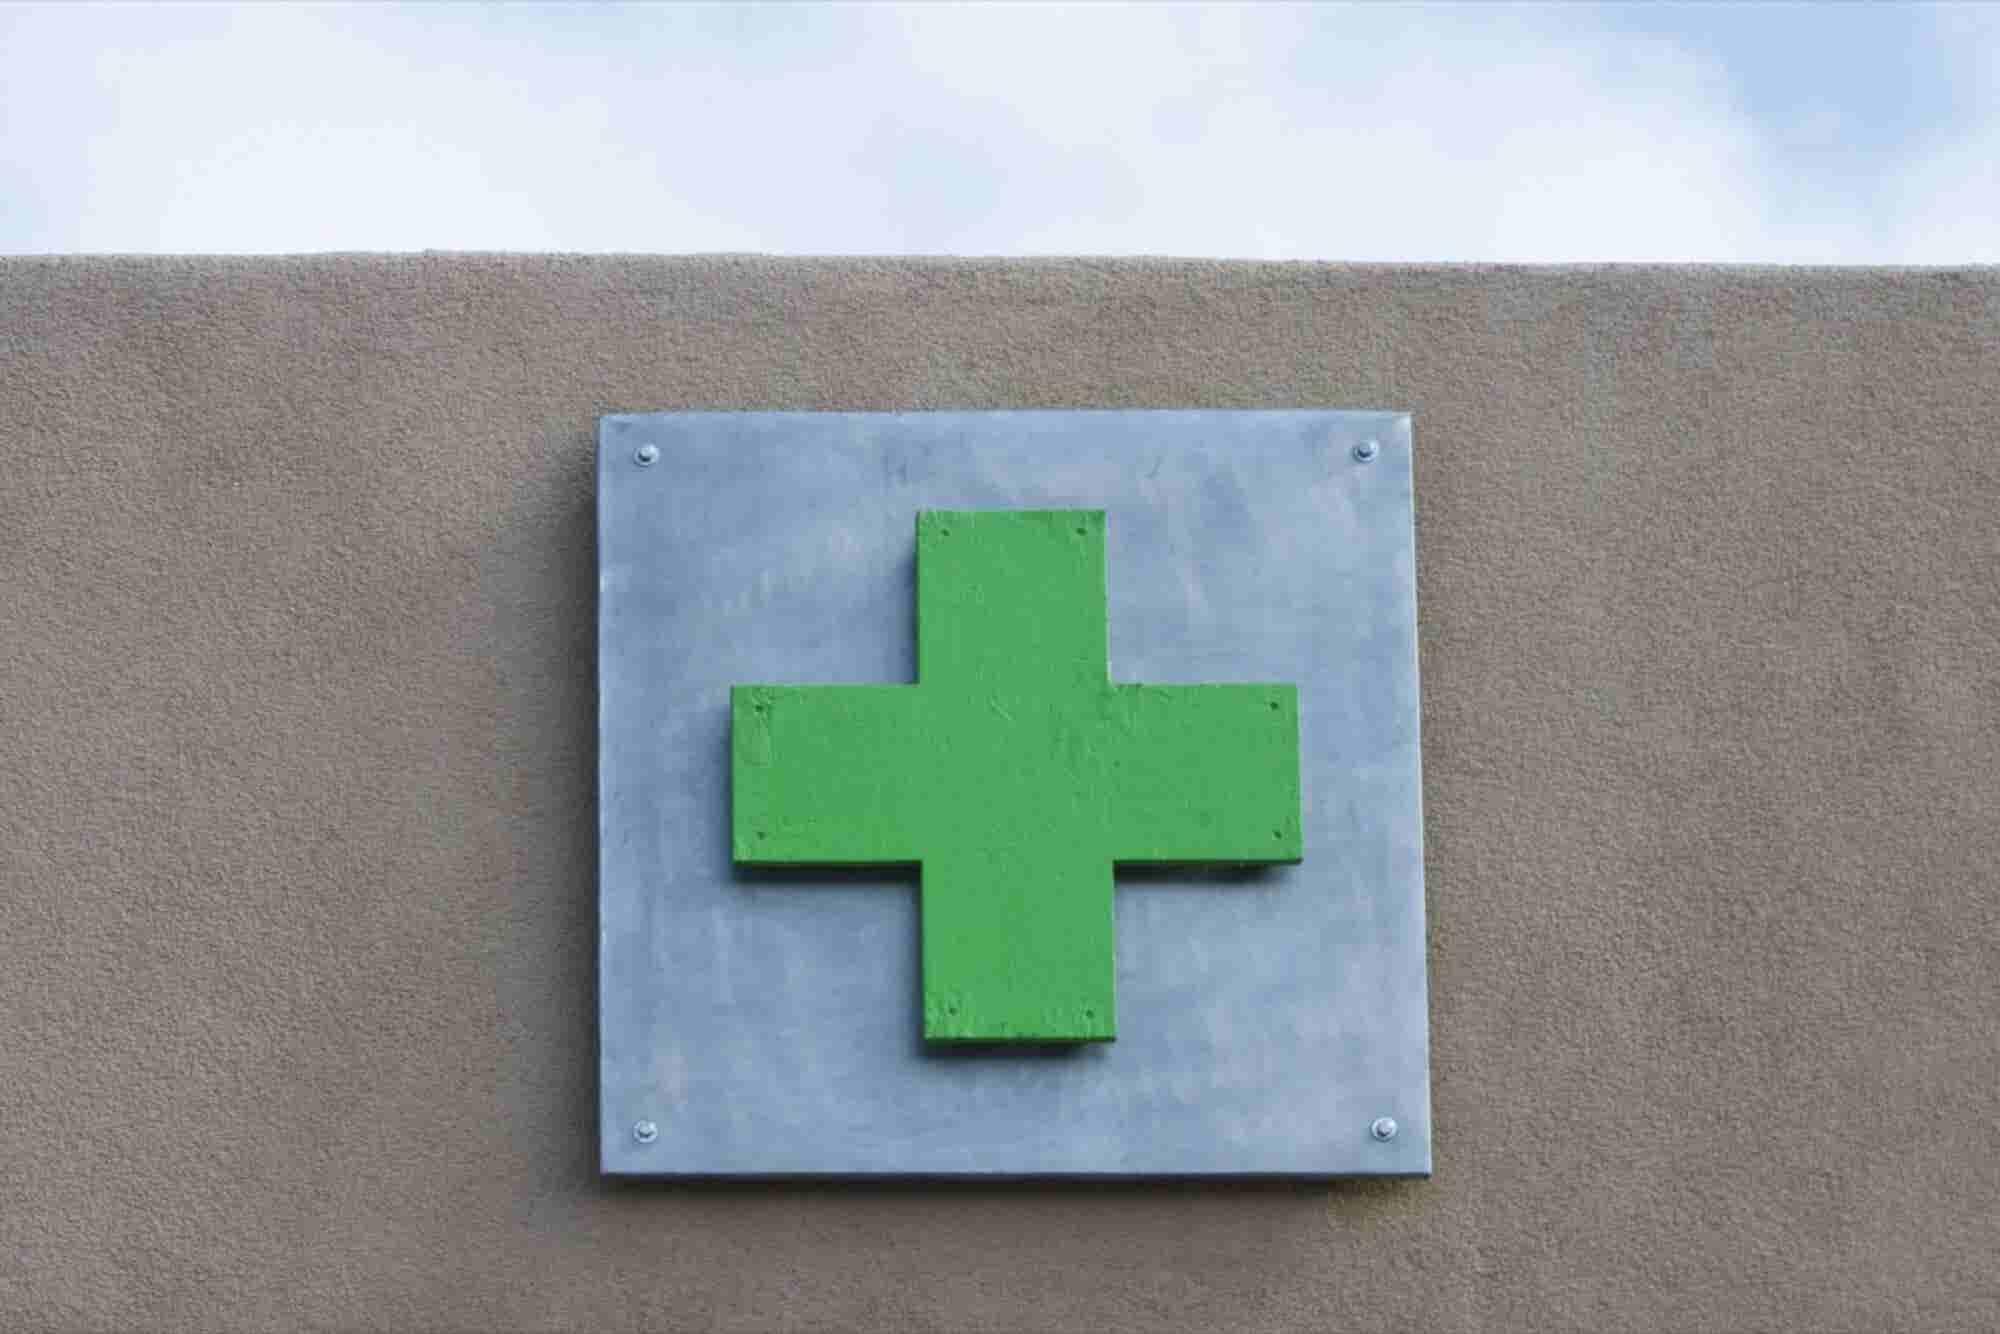 Marijuana Industry Hopes for Regulatory Stability in 2017